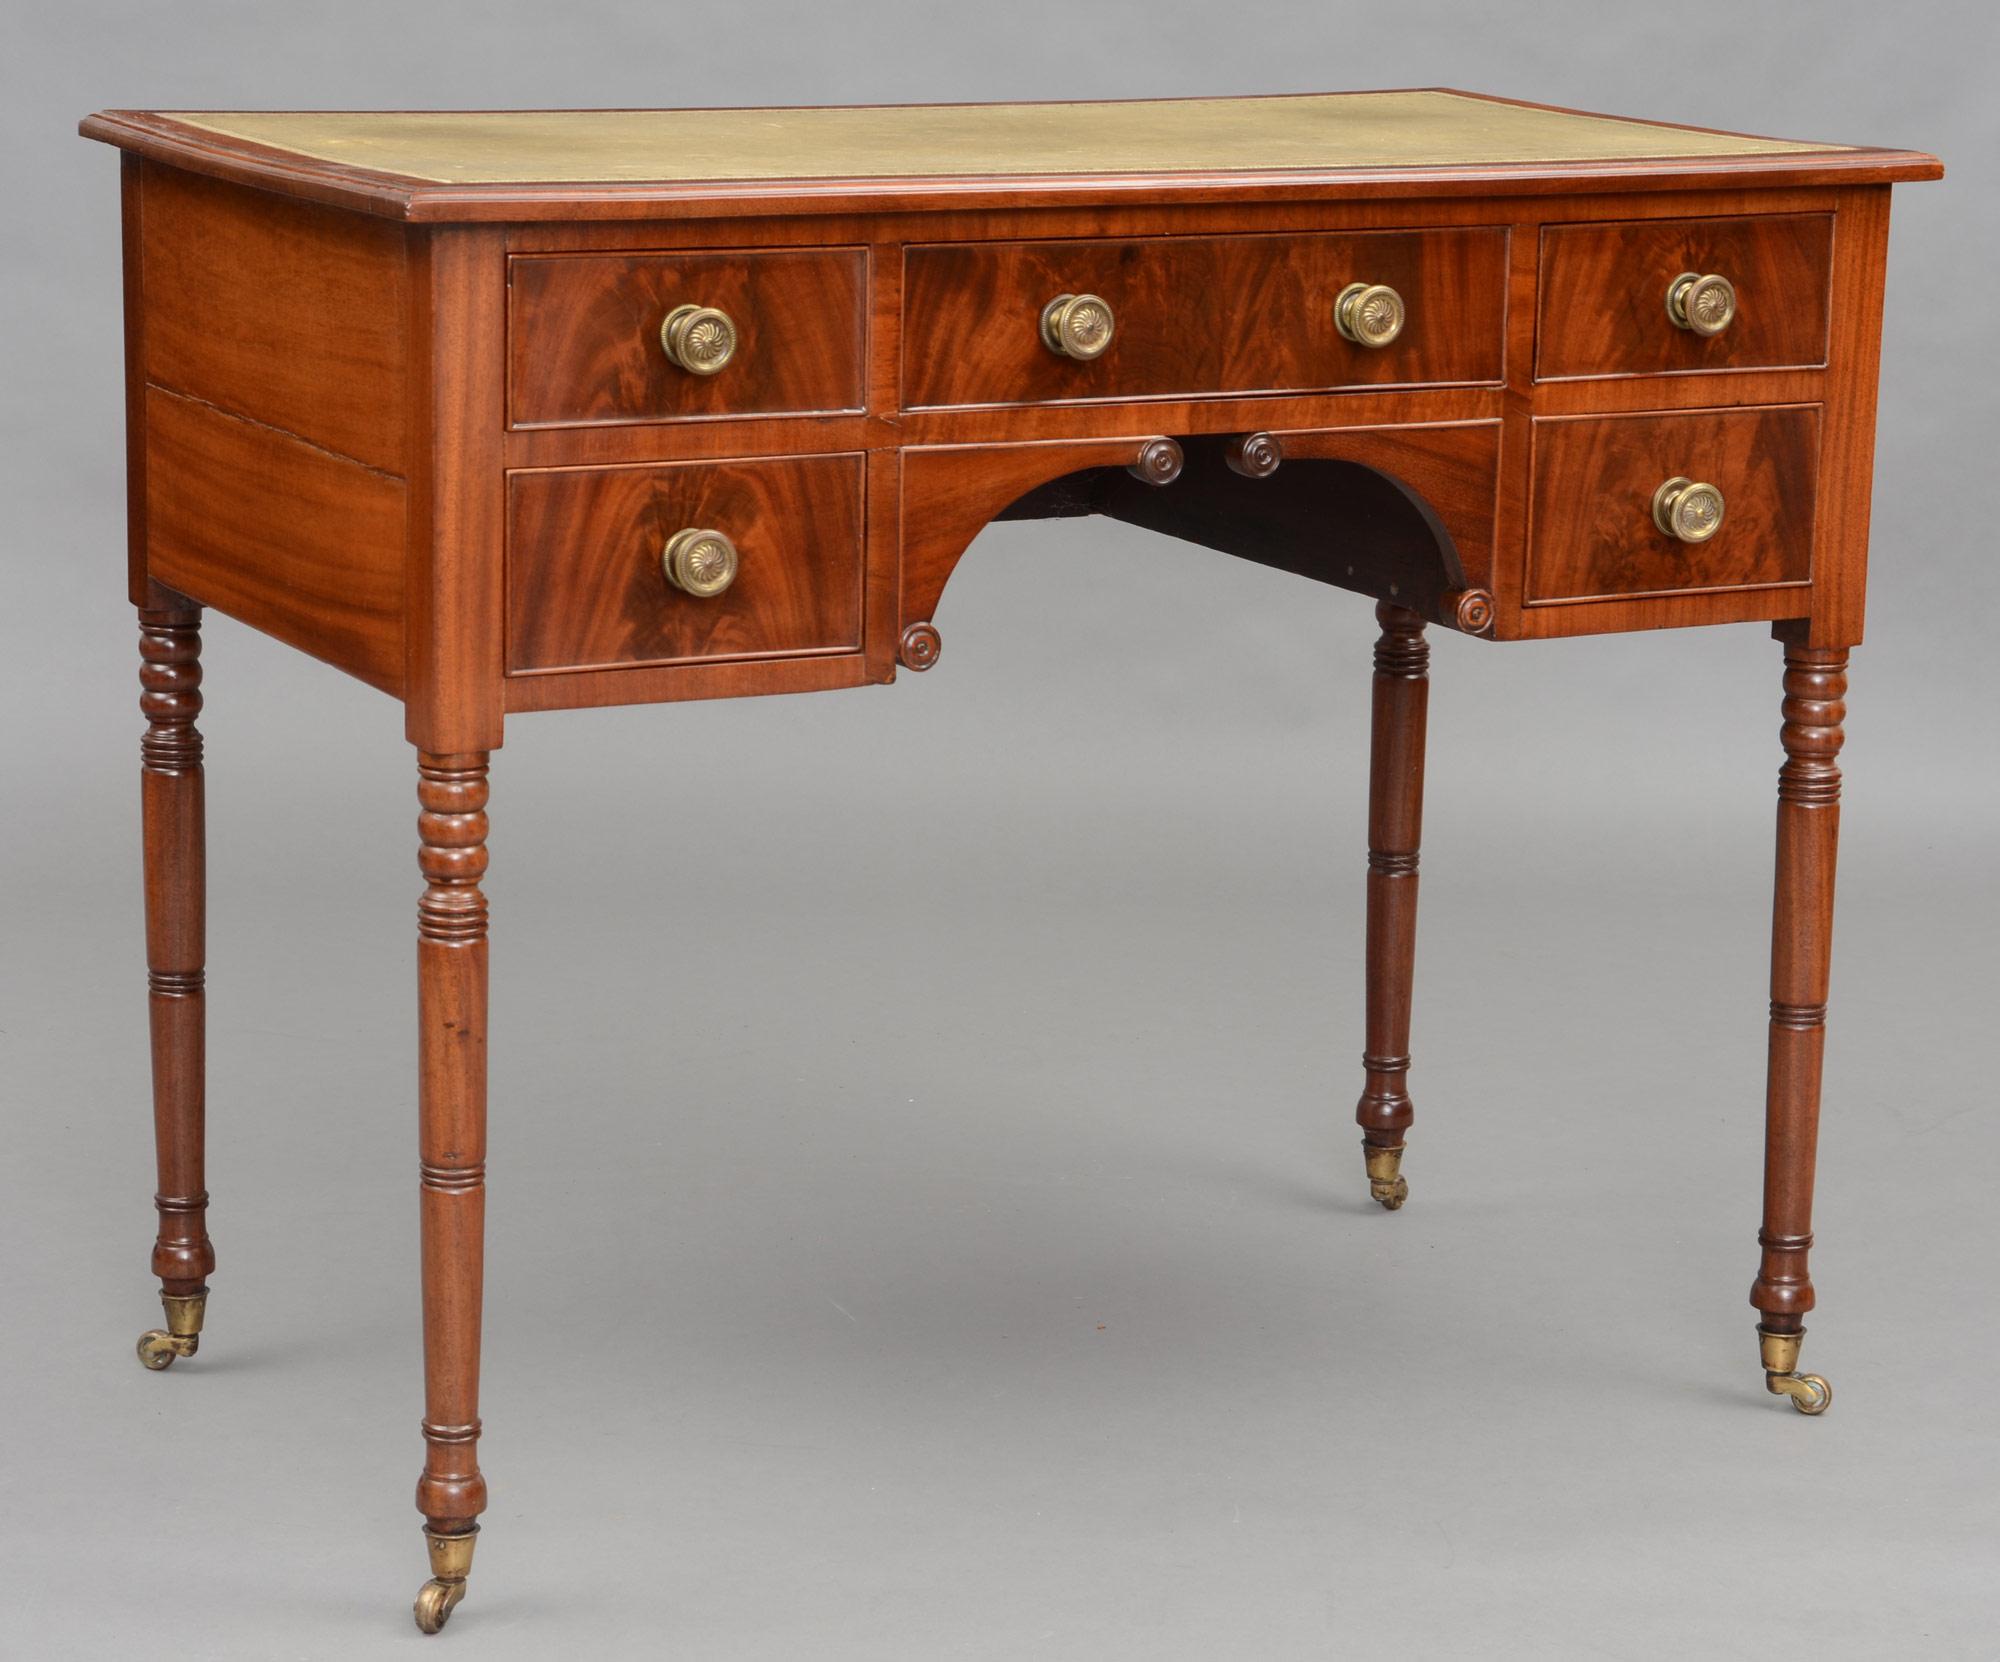 English Antique Regency Gany Las Writing Desk